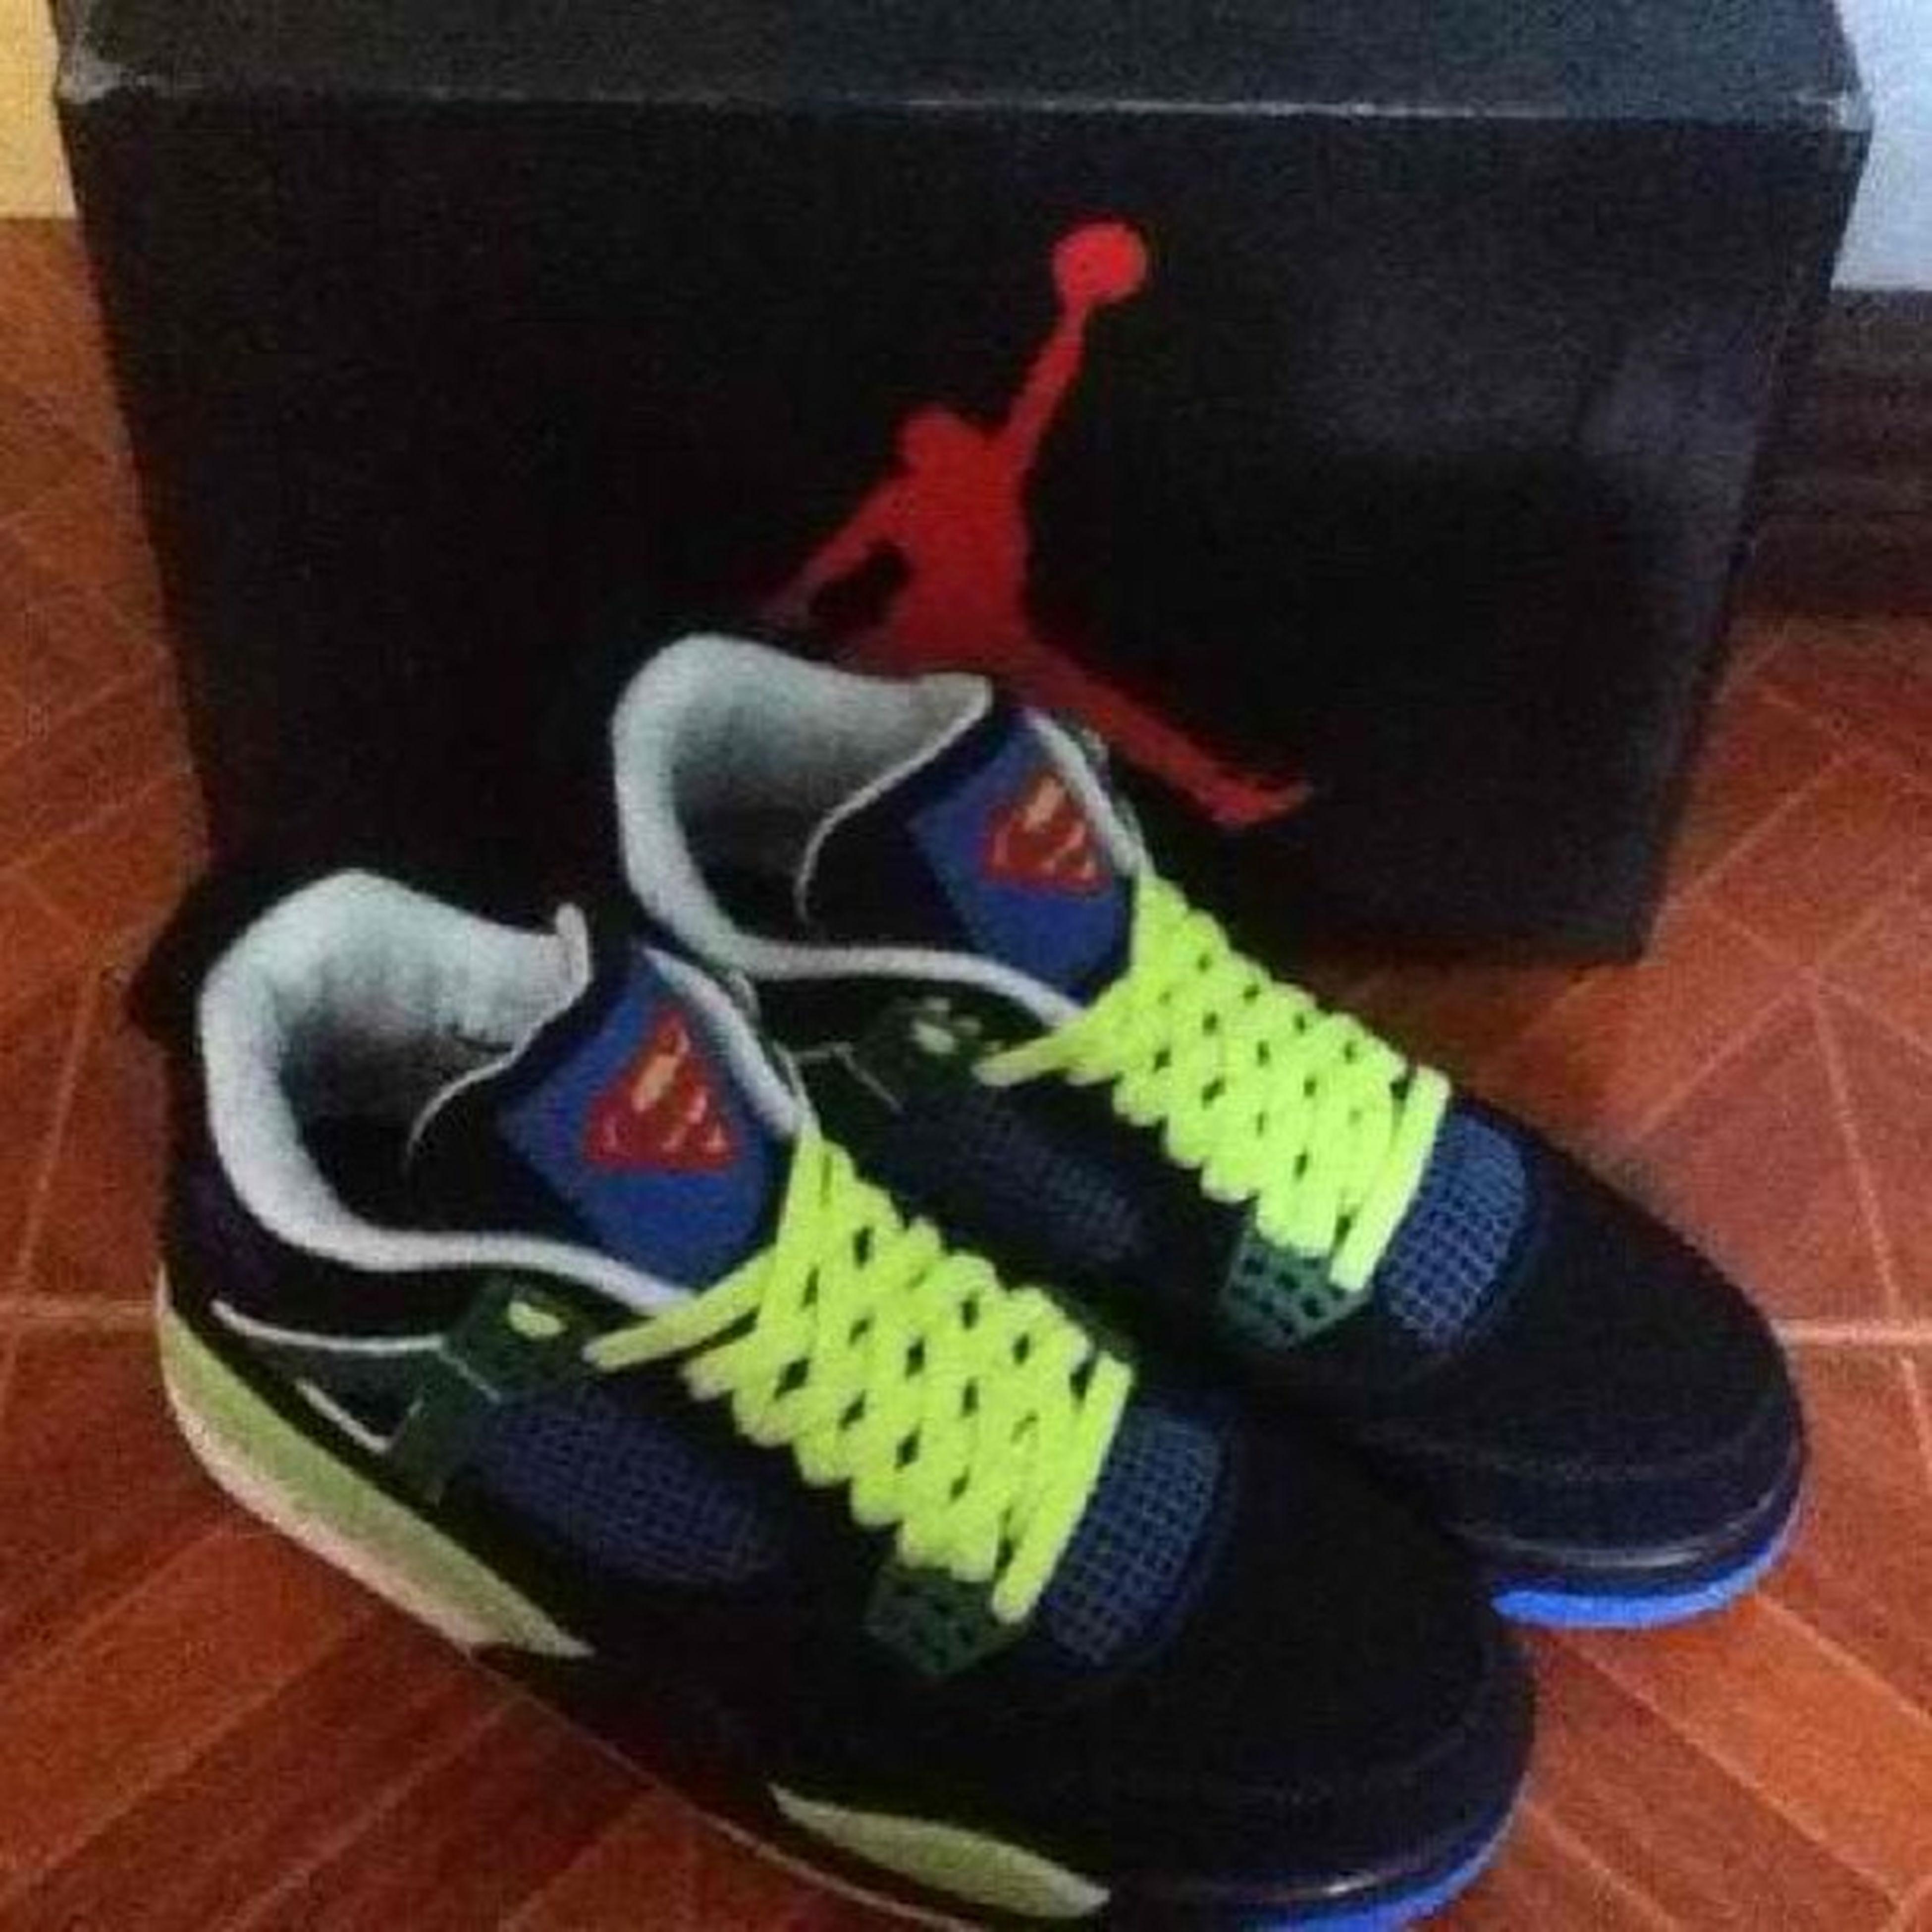 Price drop!! Jordan 4 retro Doernbecher Isaiah superman! Cop or not? Enq at 09178932502 v-alcarb@hotmail.com Retro Jordan Shoes Kicks People Nike Bball Superman Doernbechers